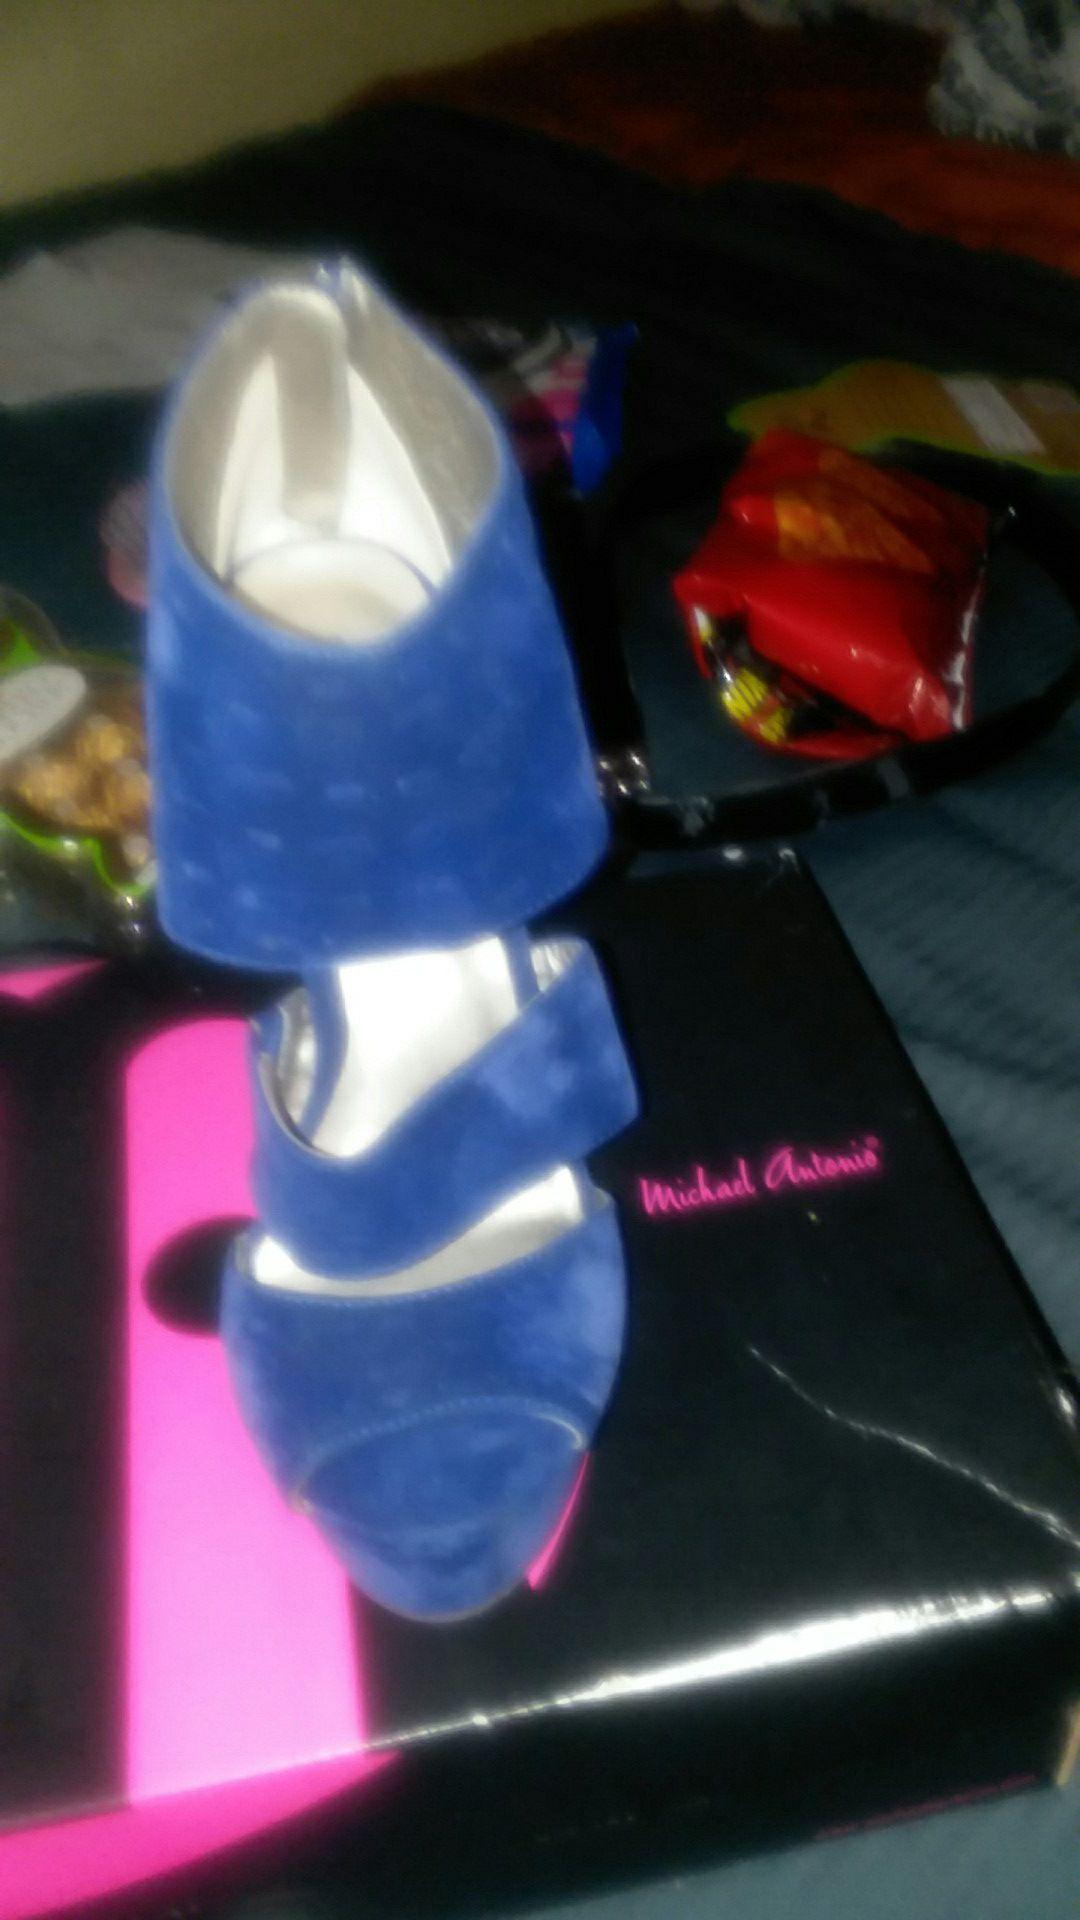 michael Antonio sandal/heels $25